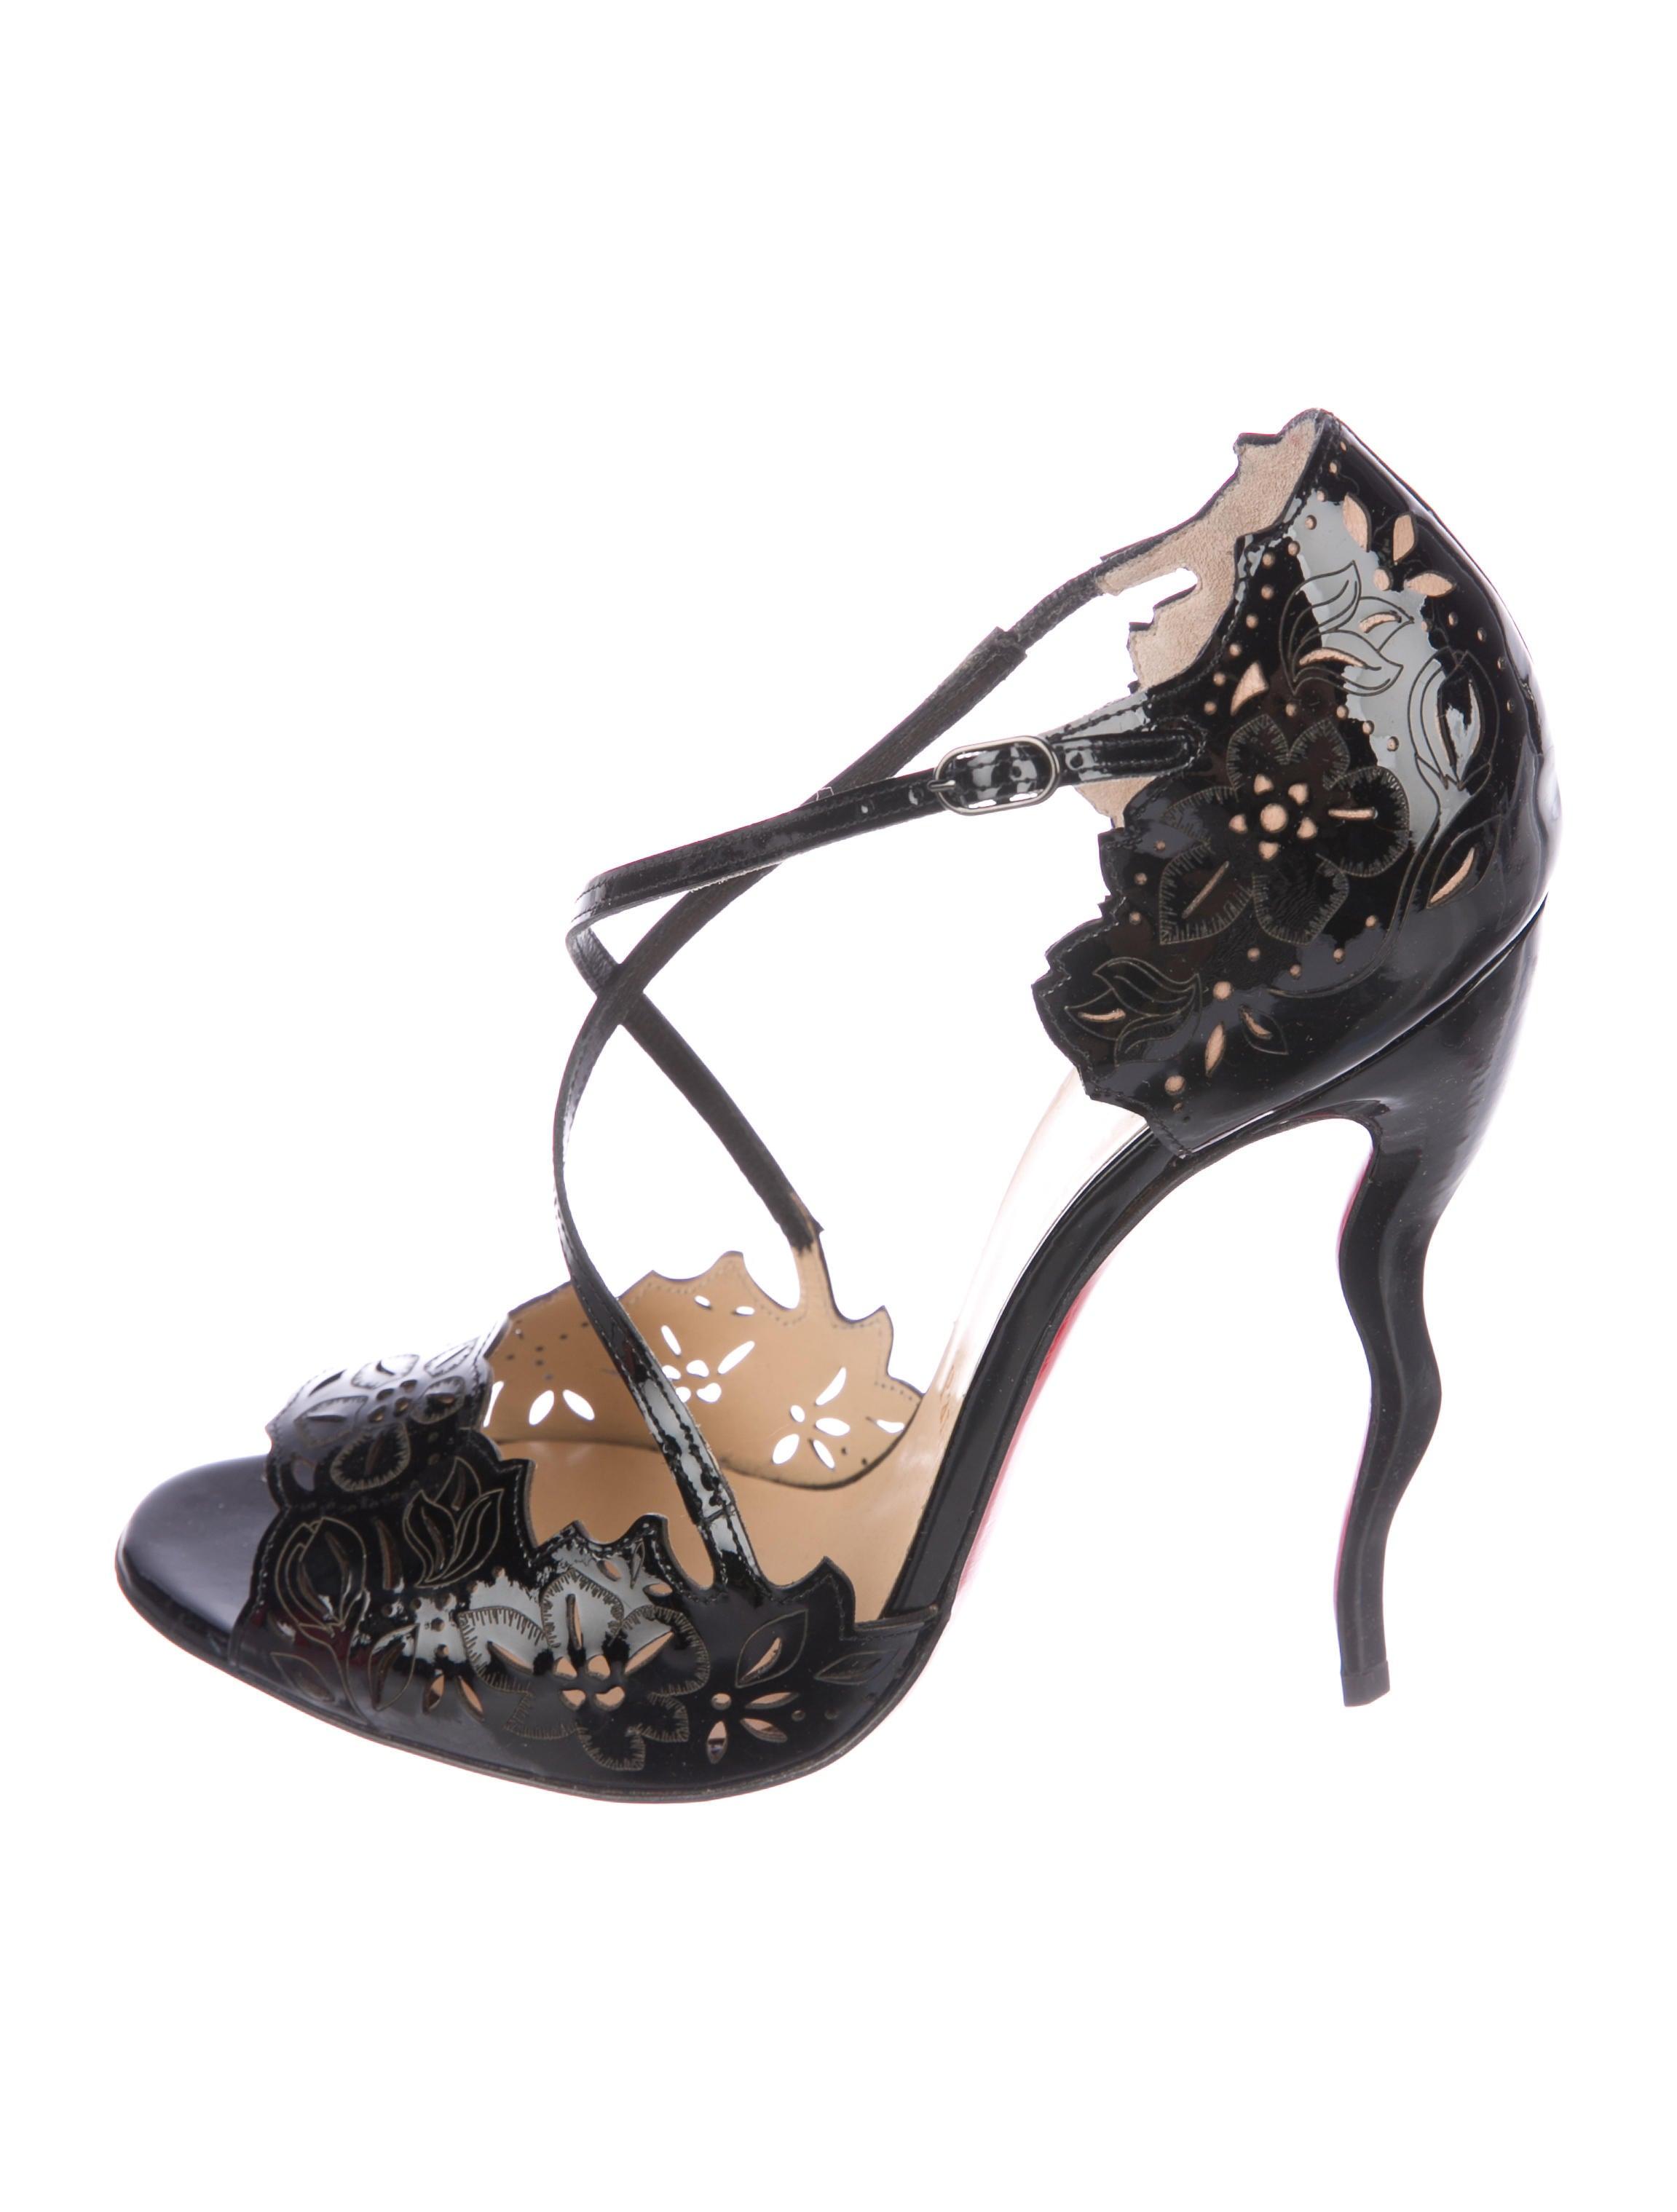 758dc66fc77 Christian Louboutin Enchantee Laser Cut Pumps - Shoes - CHT98871 ...